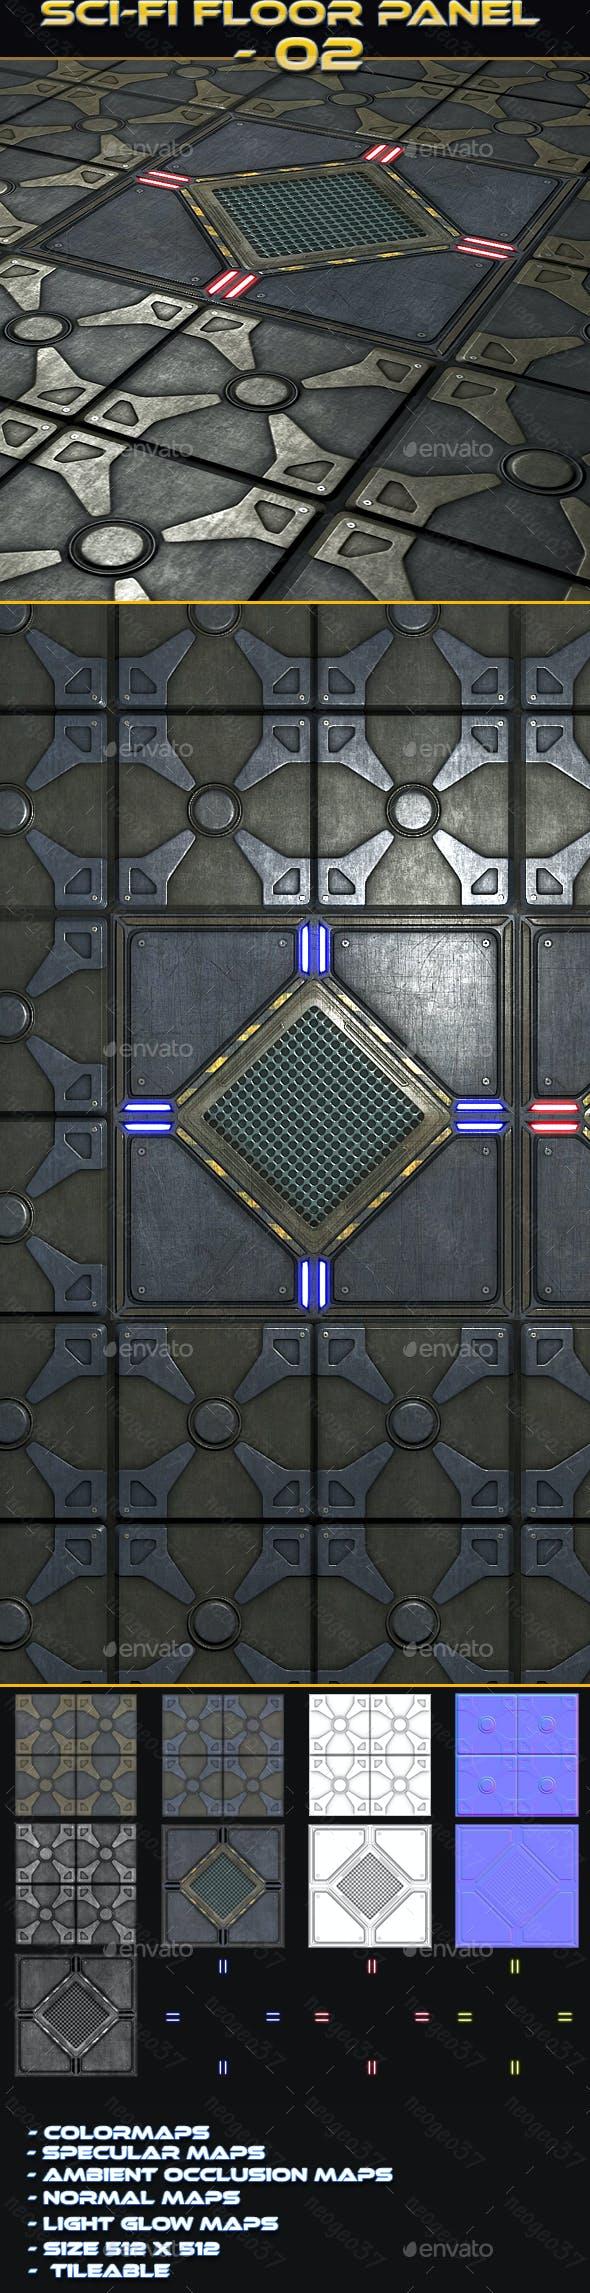 Sci-fi Floor Panel 02 - 3DOcean Item for Sale